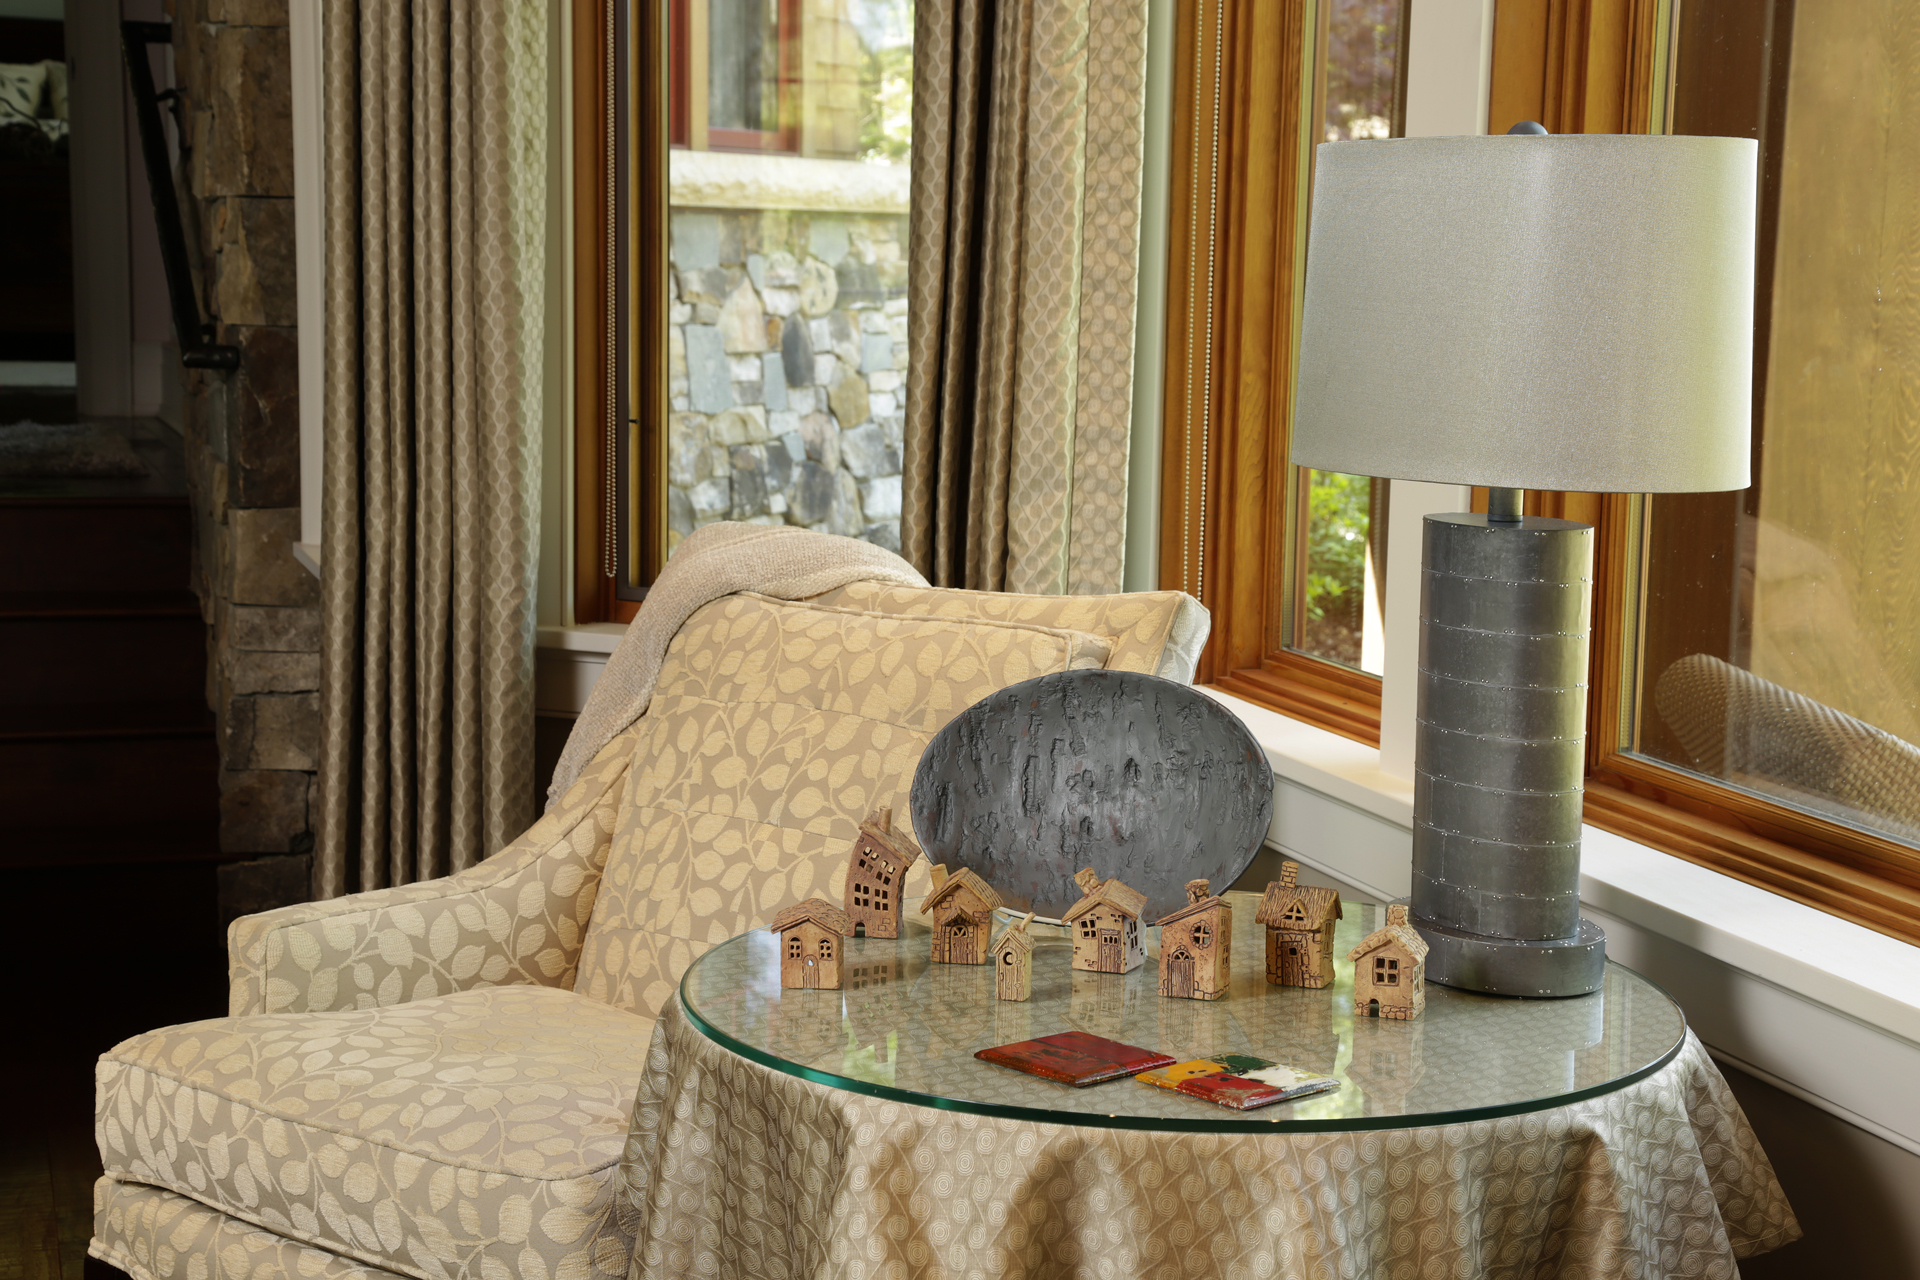 Platter by Dearing Davis, Tiny Village by Karen Dubois